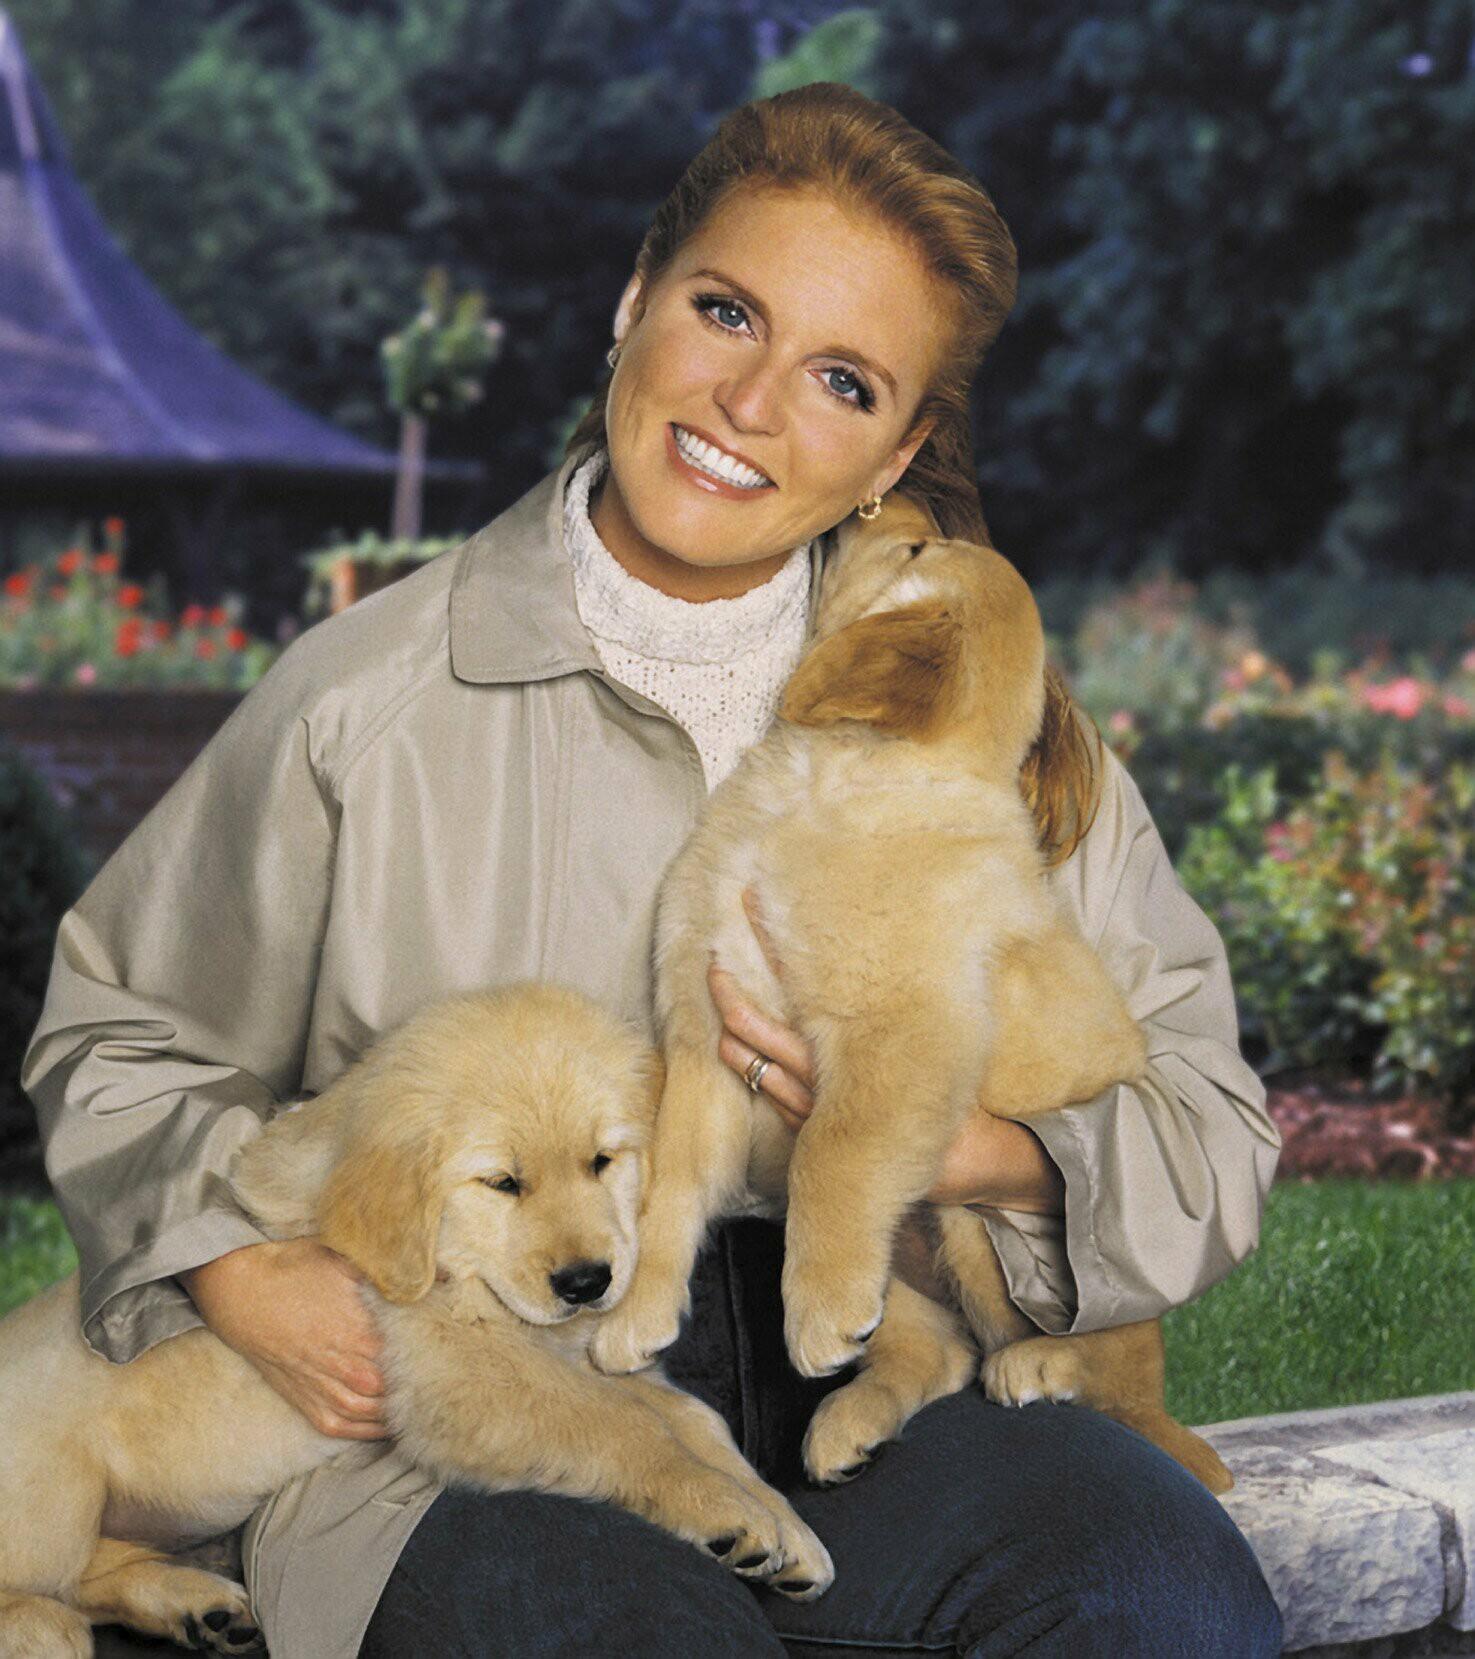 Fergie Khaki Jacket Holds Golden Retriever Pupples